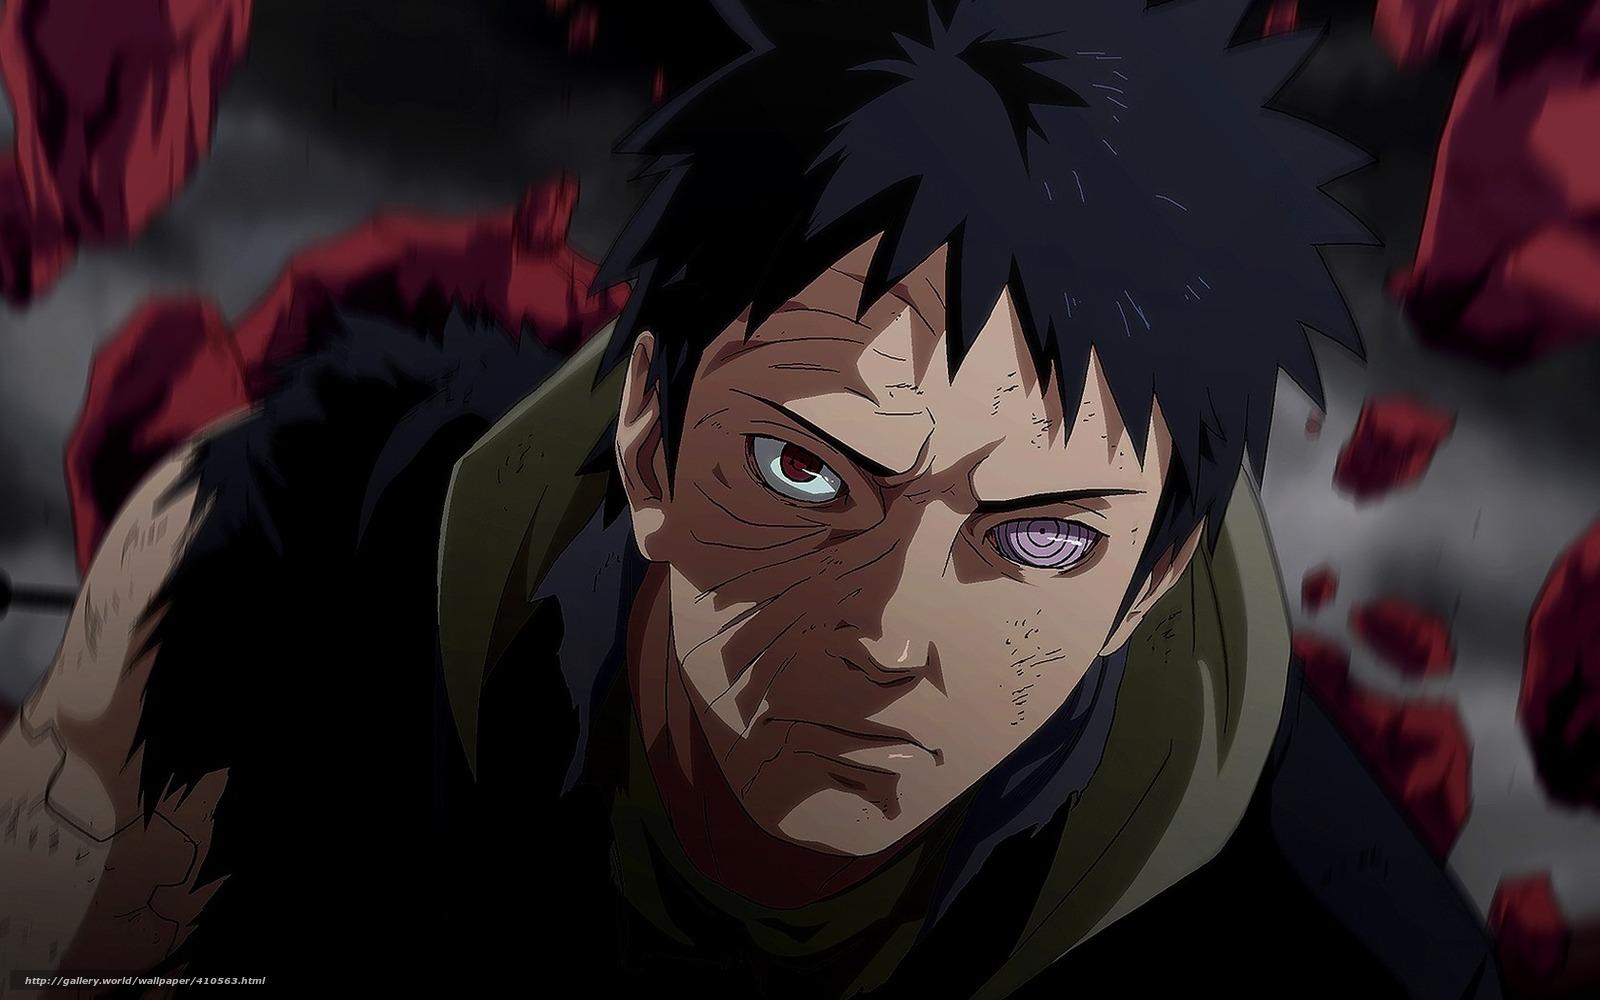 Papel de parede Uchiha Obito furaco crnicas sharingan Naruto 1600x1000